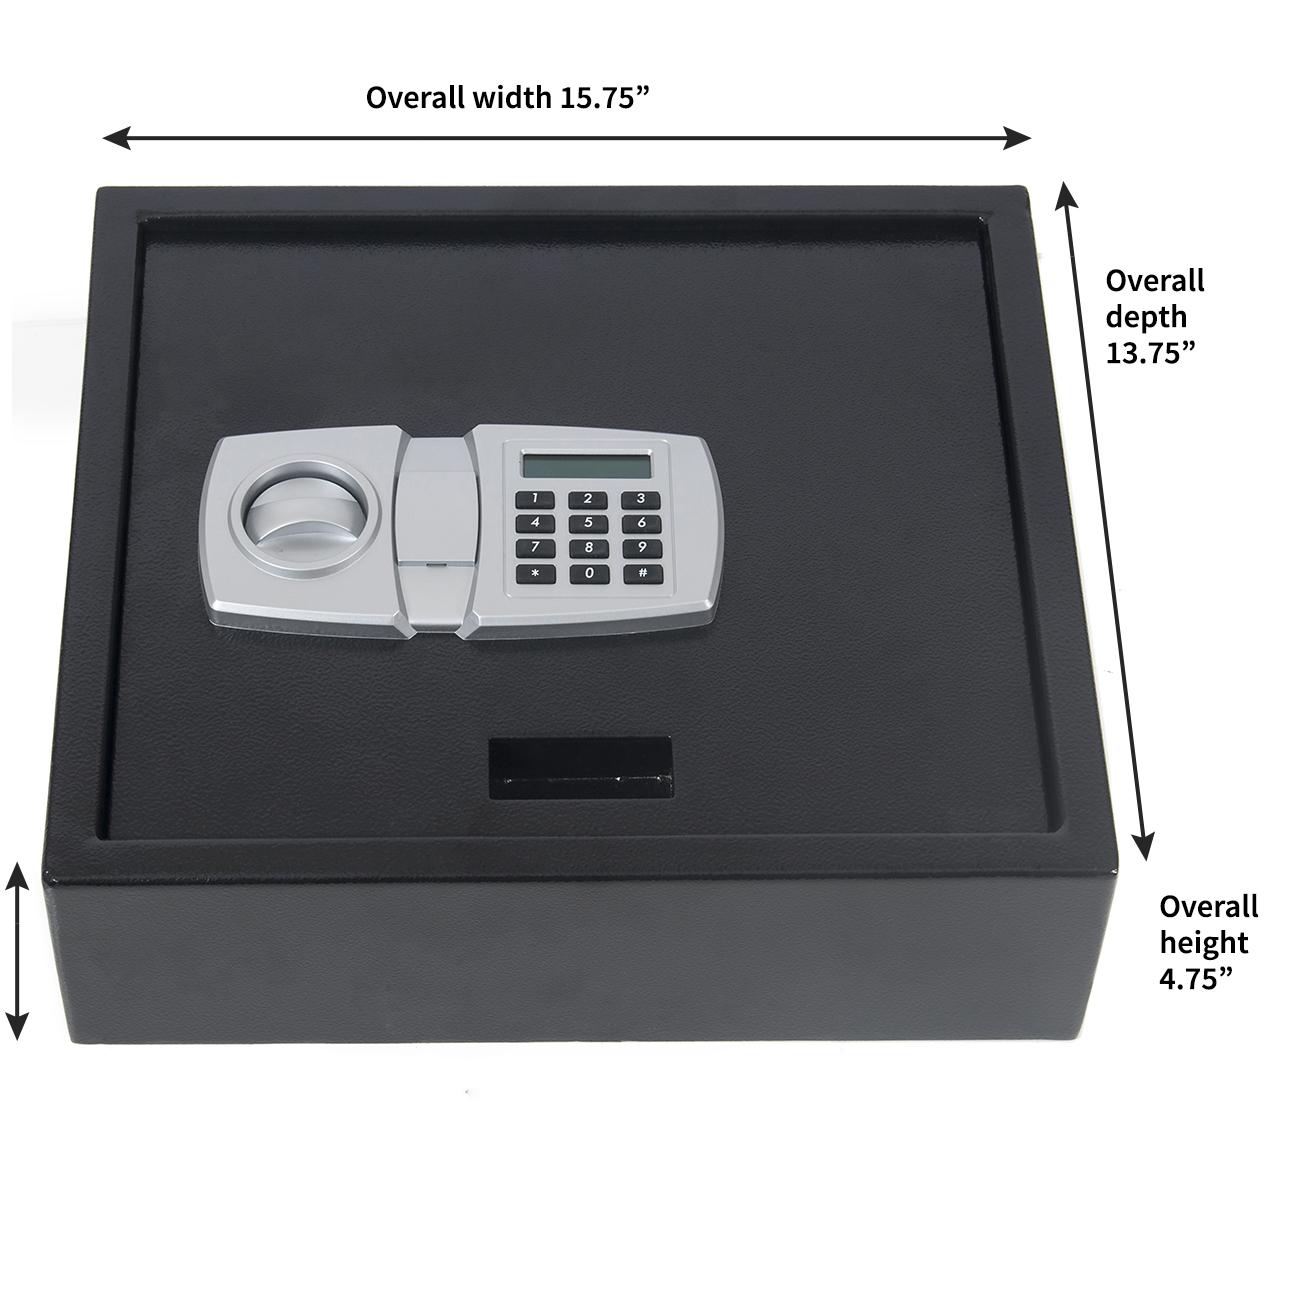 Digital Lcd Lock Electronic Keypad Top Opening Safe